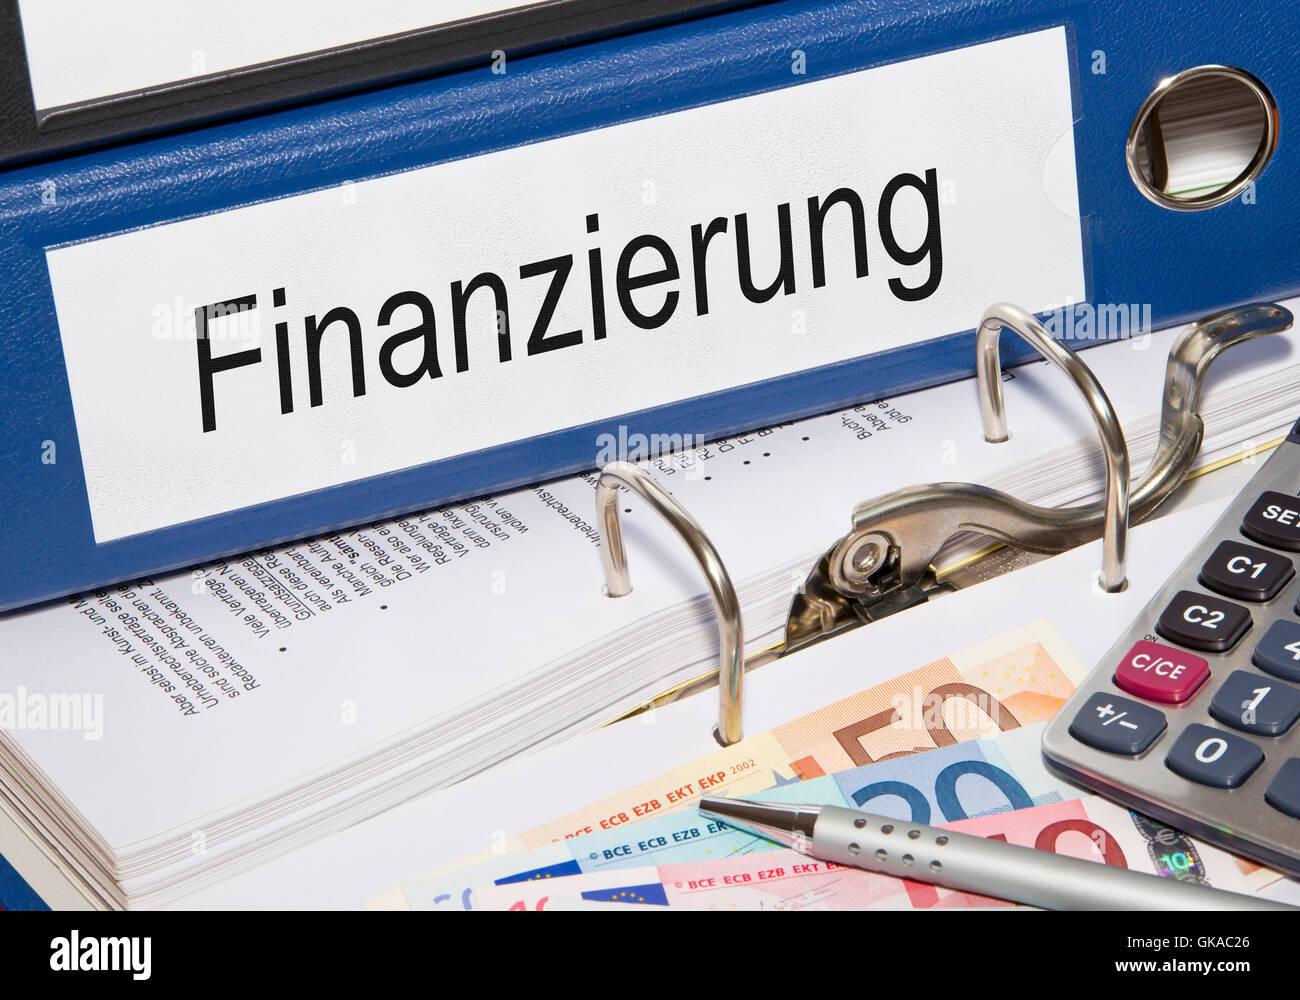 funding - Stock Image